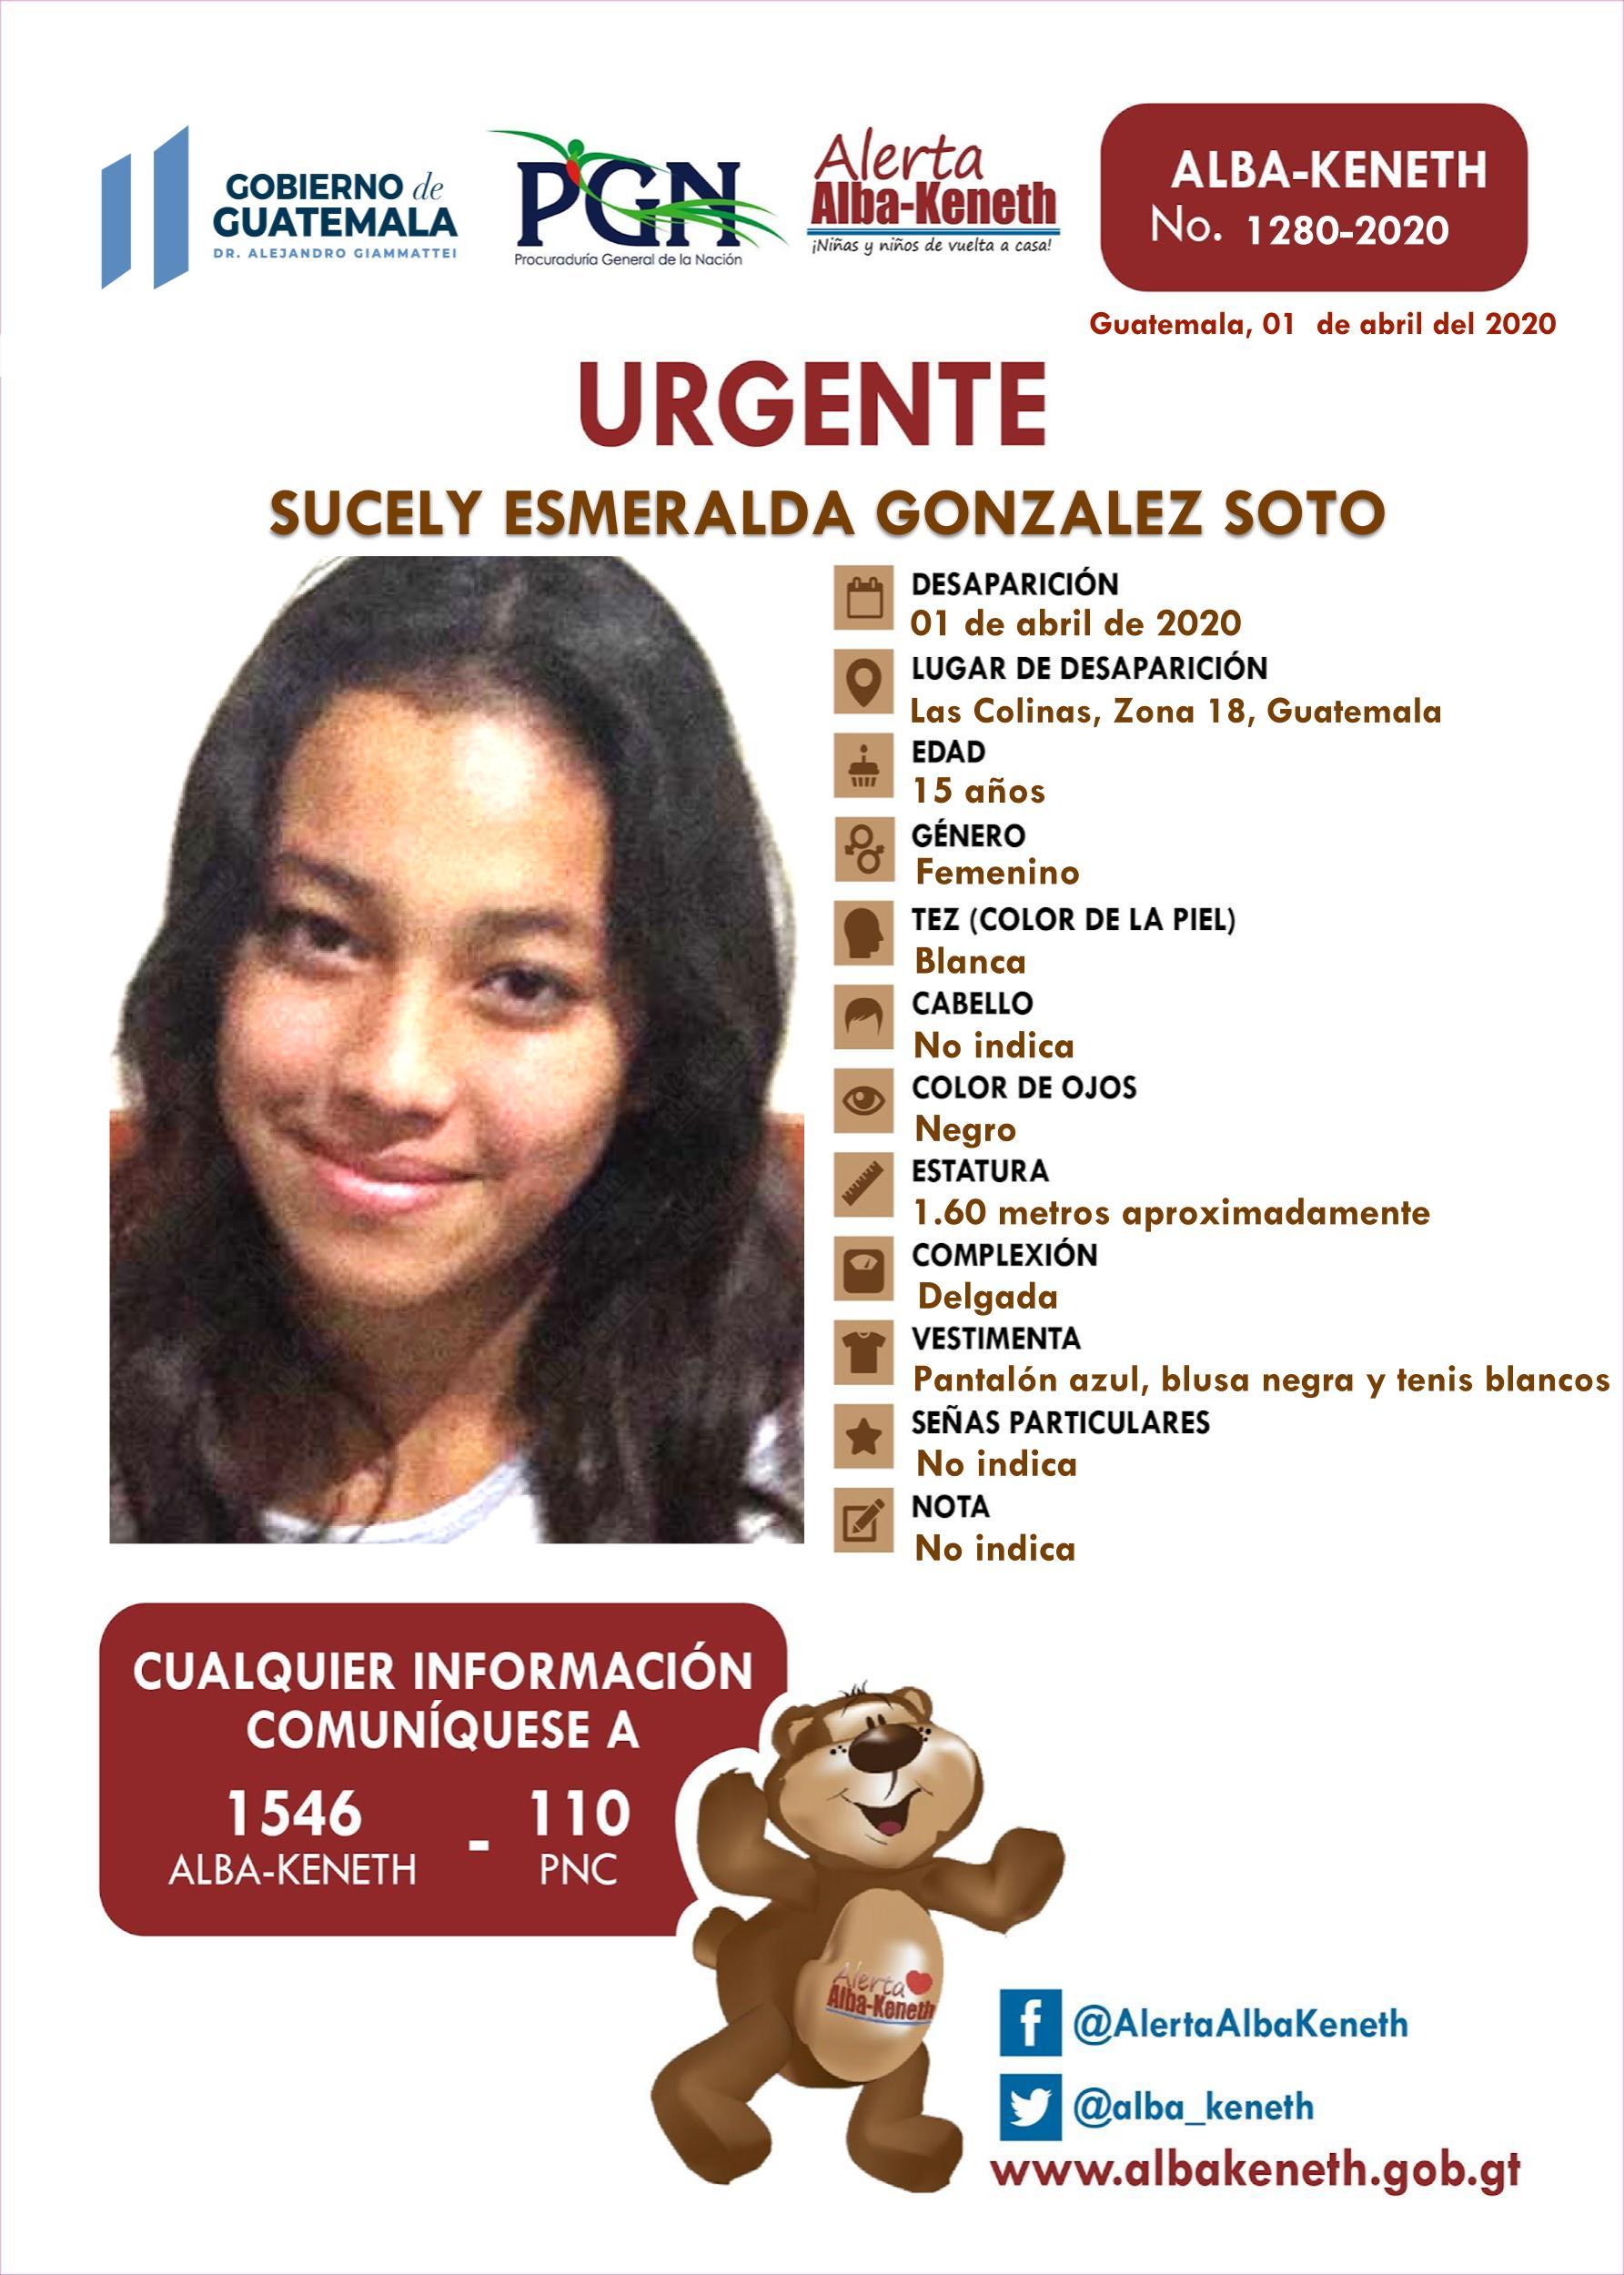 Sucely Esmeralda Gonzalez Soto